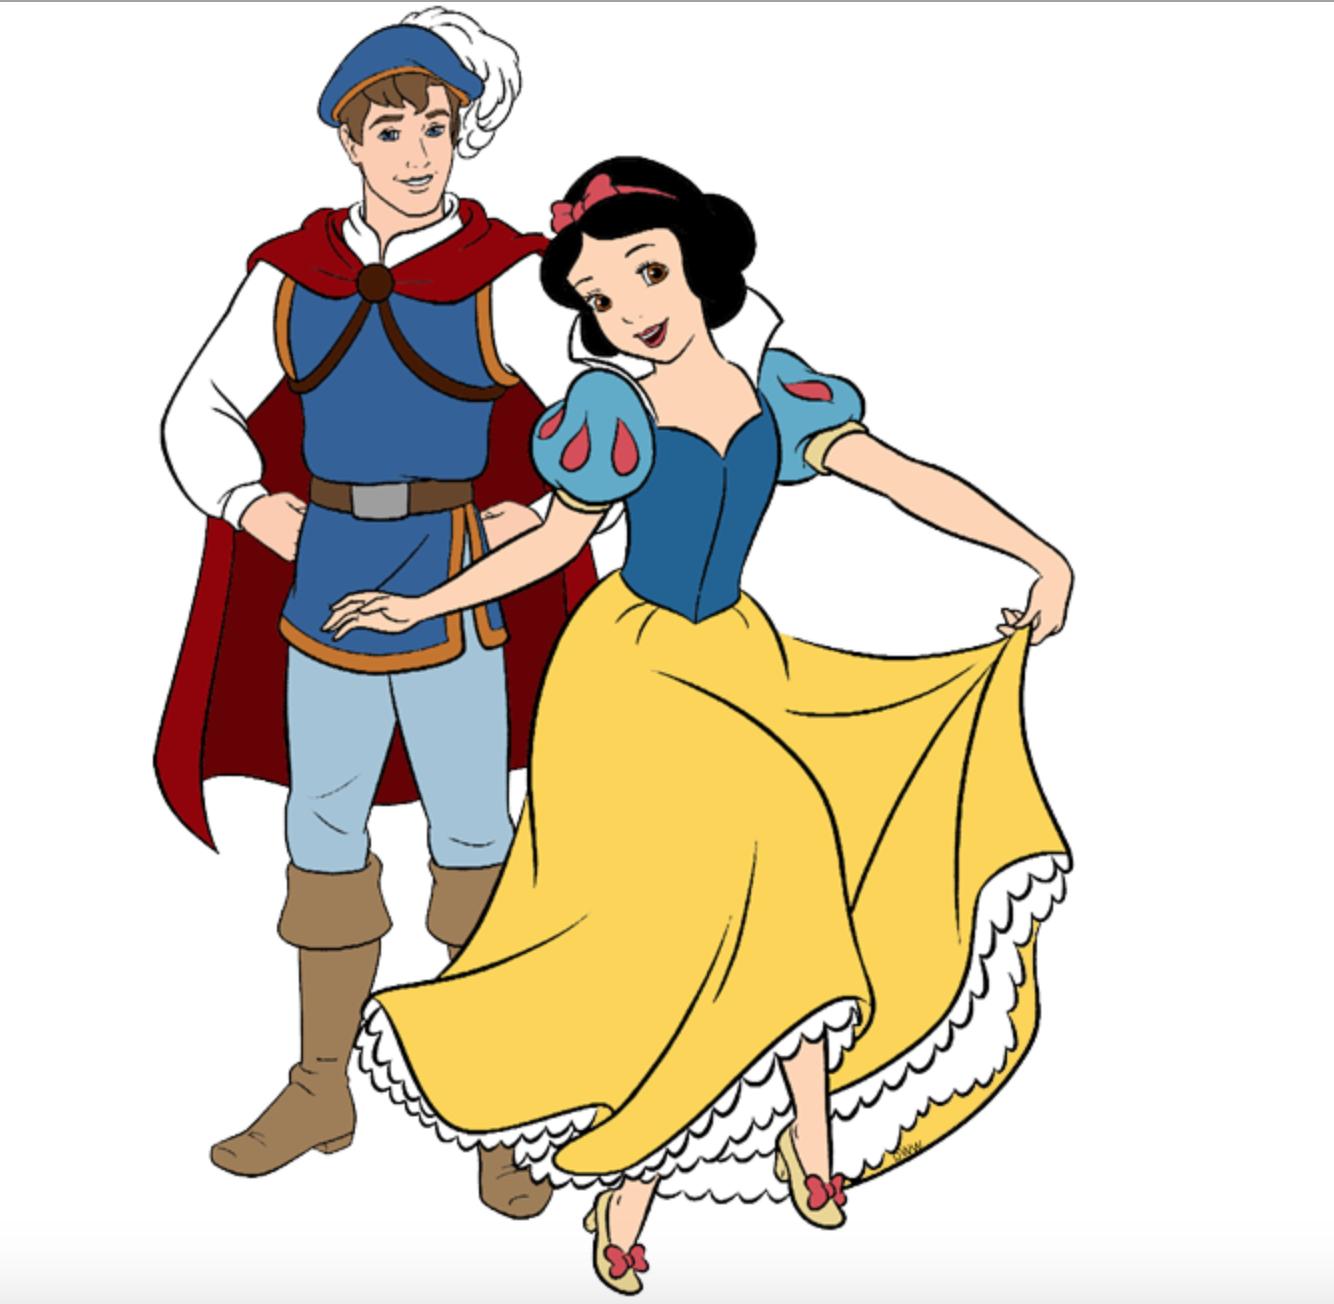 Snow White And Her Prince Blancanieves Y El Principe Princesas Disney Blancanieves Imagenes